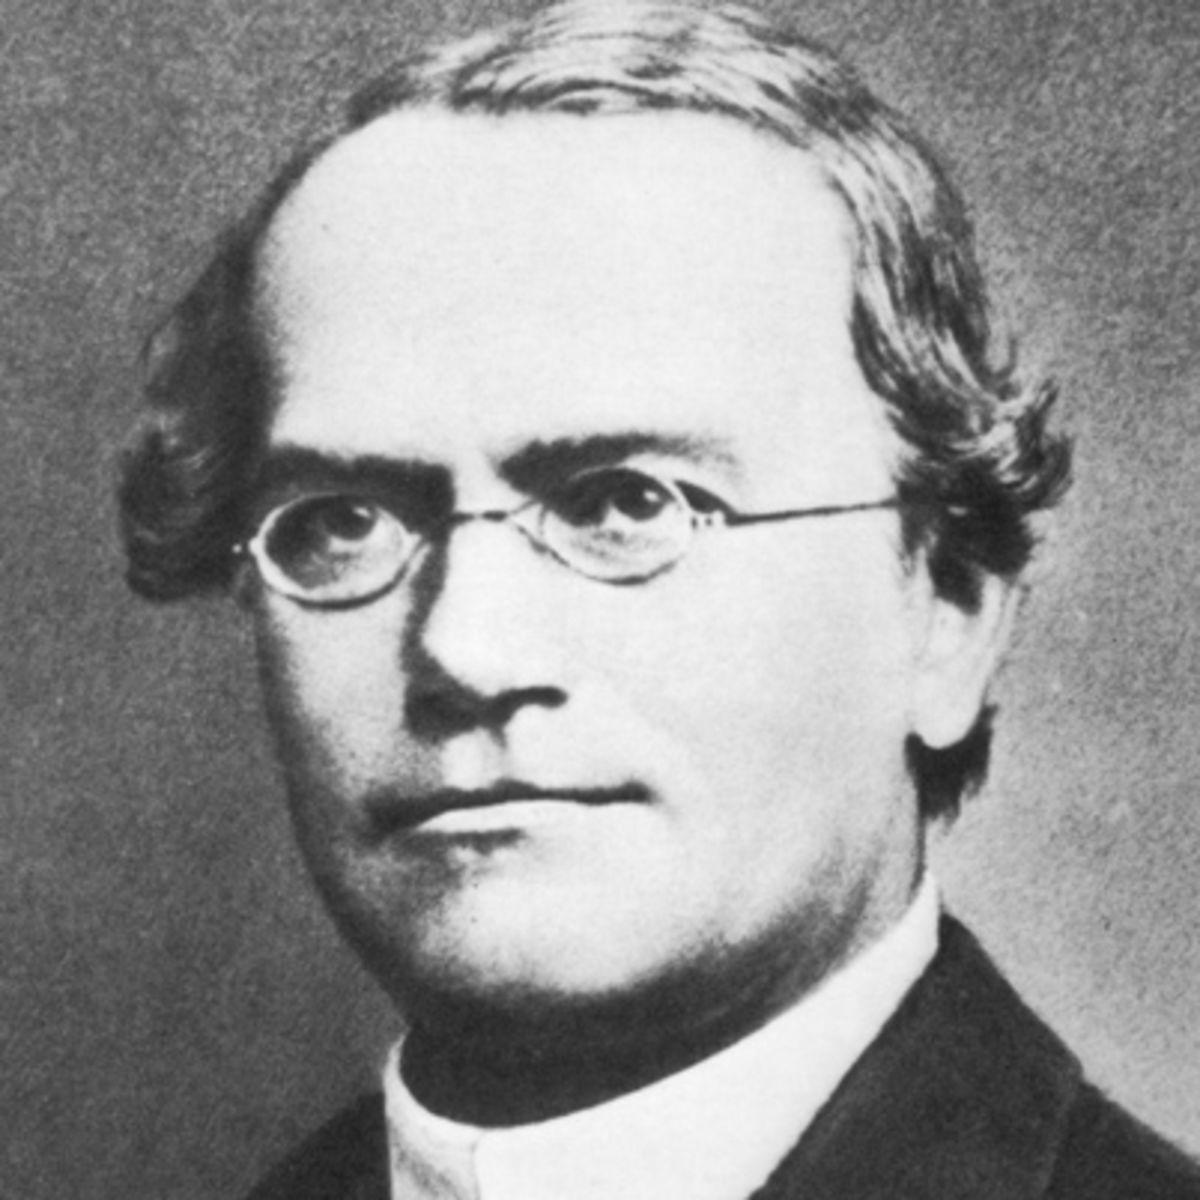 gregor mendel biography video of albert